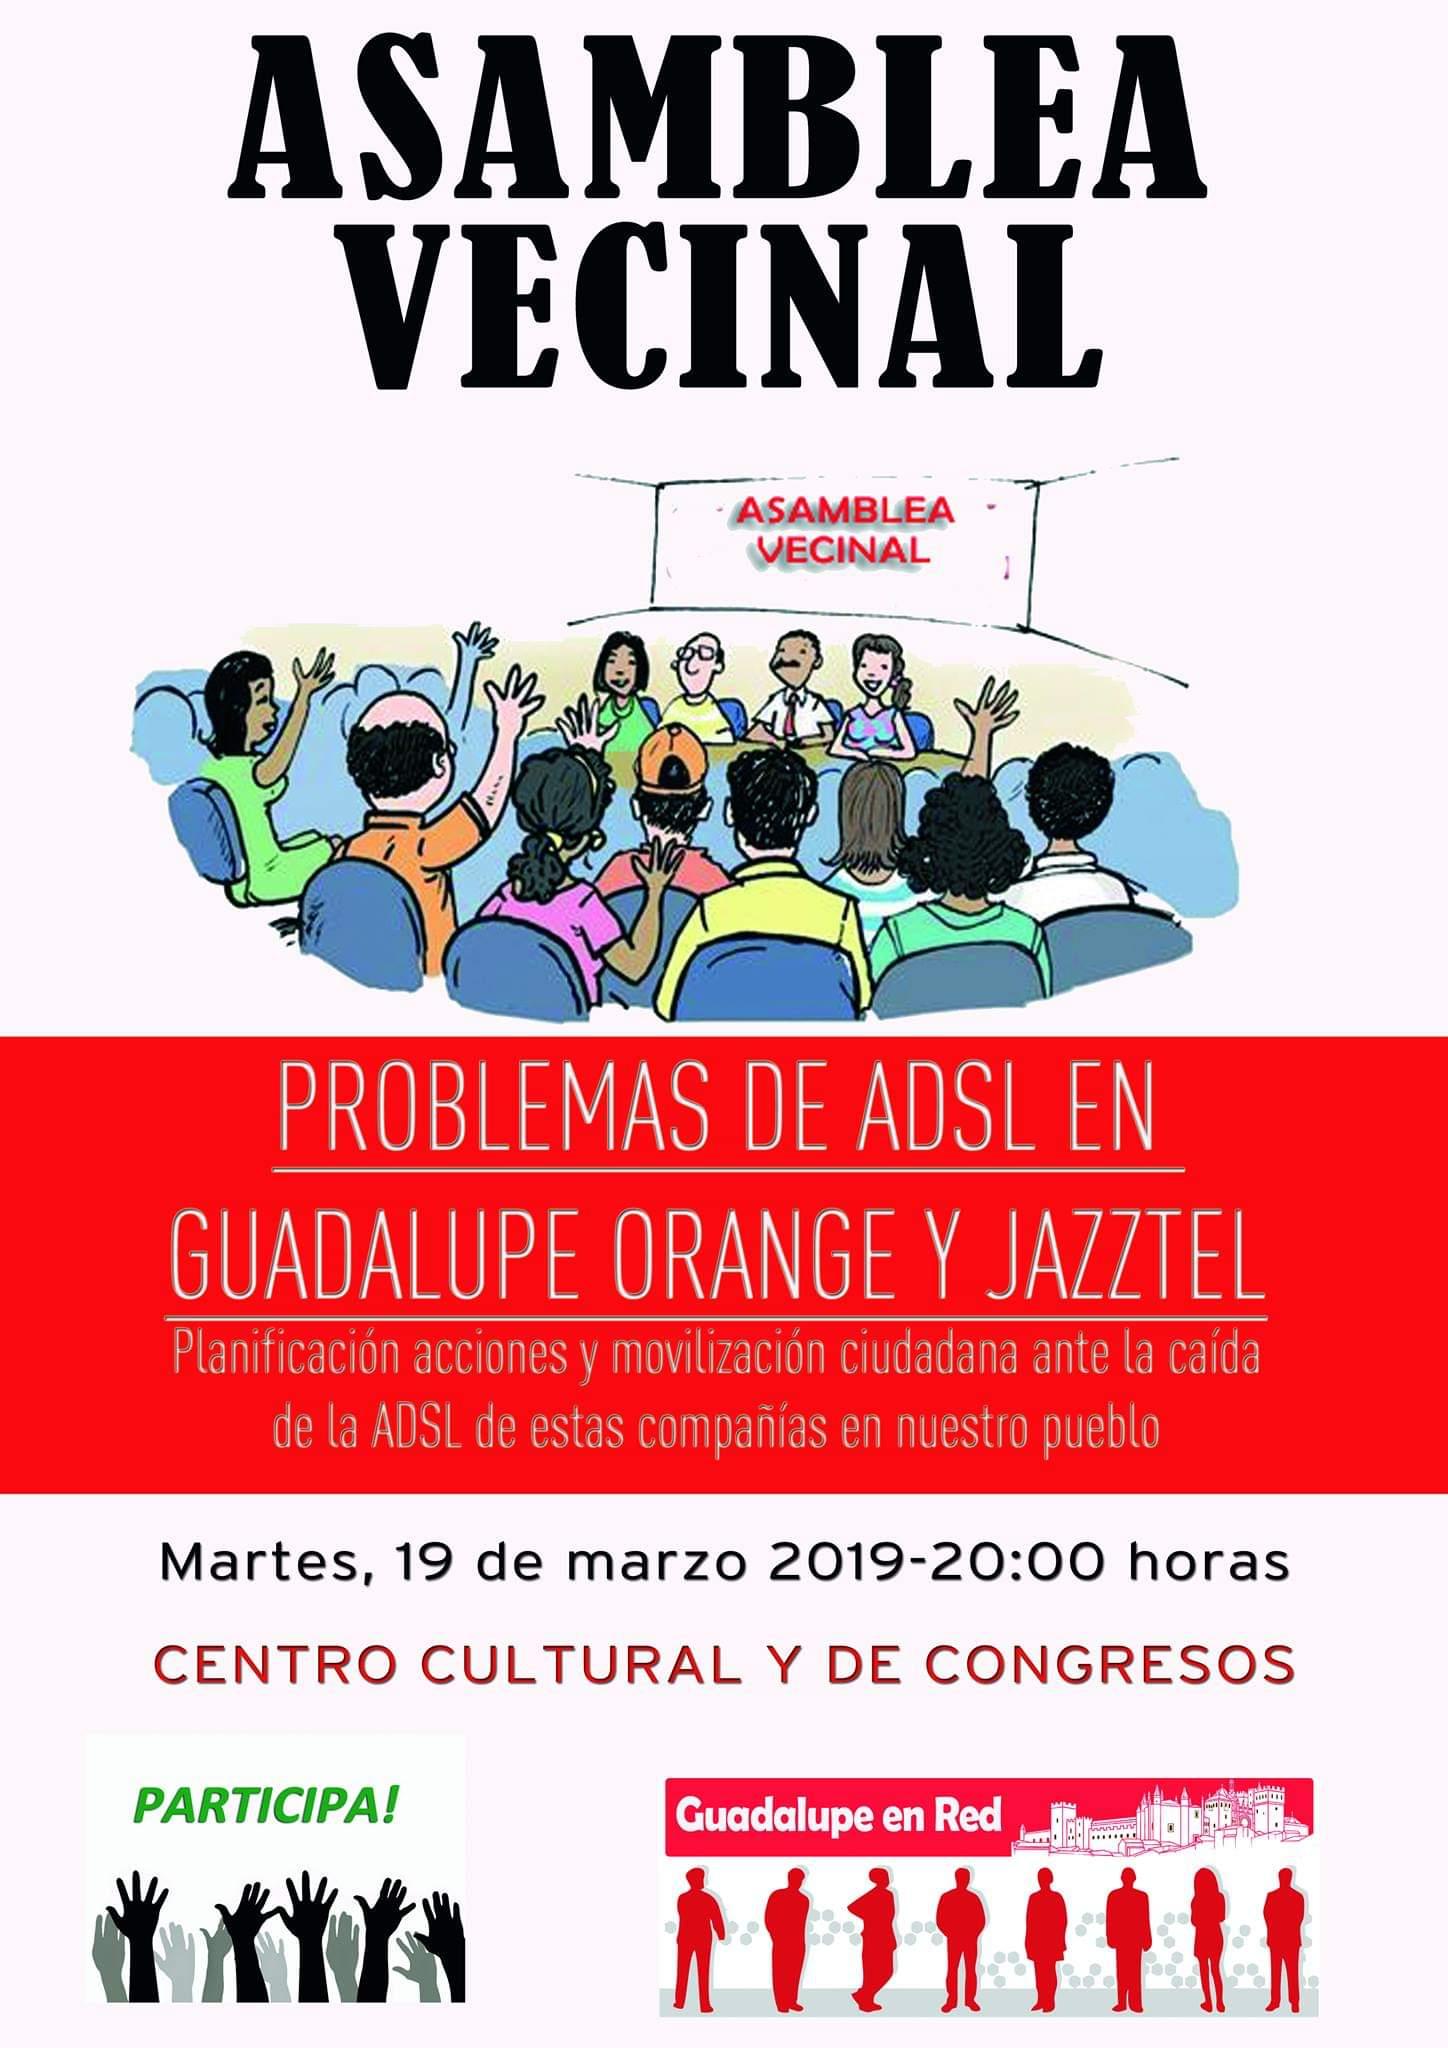 Asamblea vecinal de problemas de ADSL con Orange 2019 - Guadalupe (Cáceres)